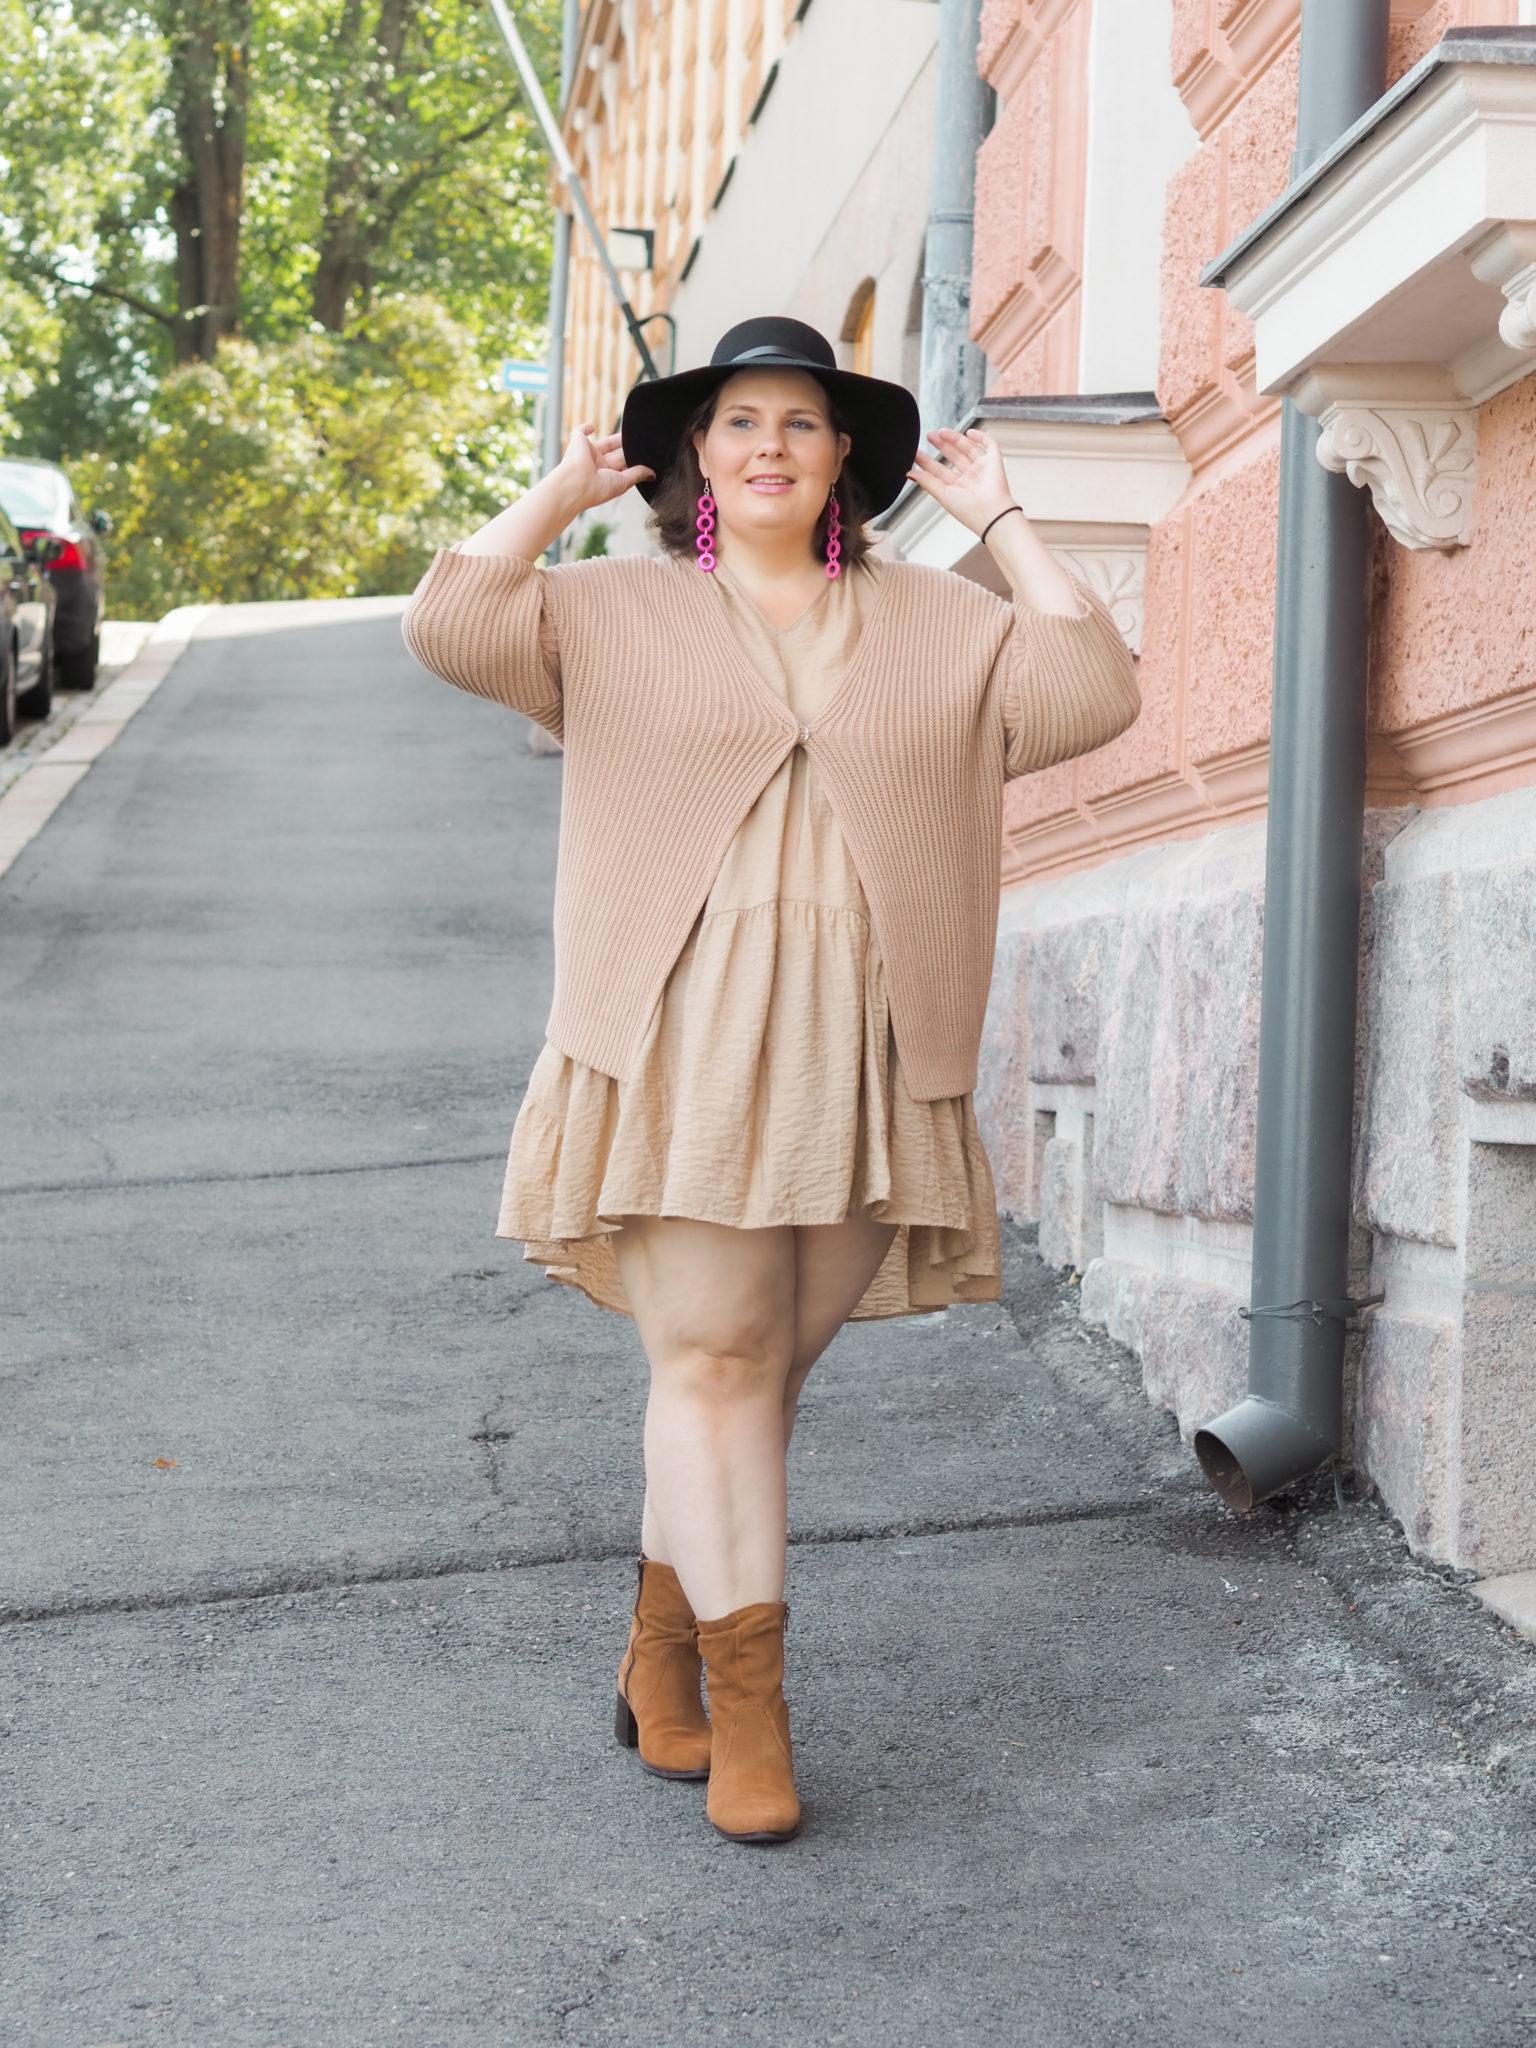 Kesämekko stailattuna syksyyn - BMH - Big mamas home by Jenni